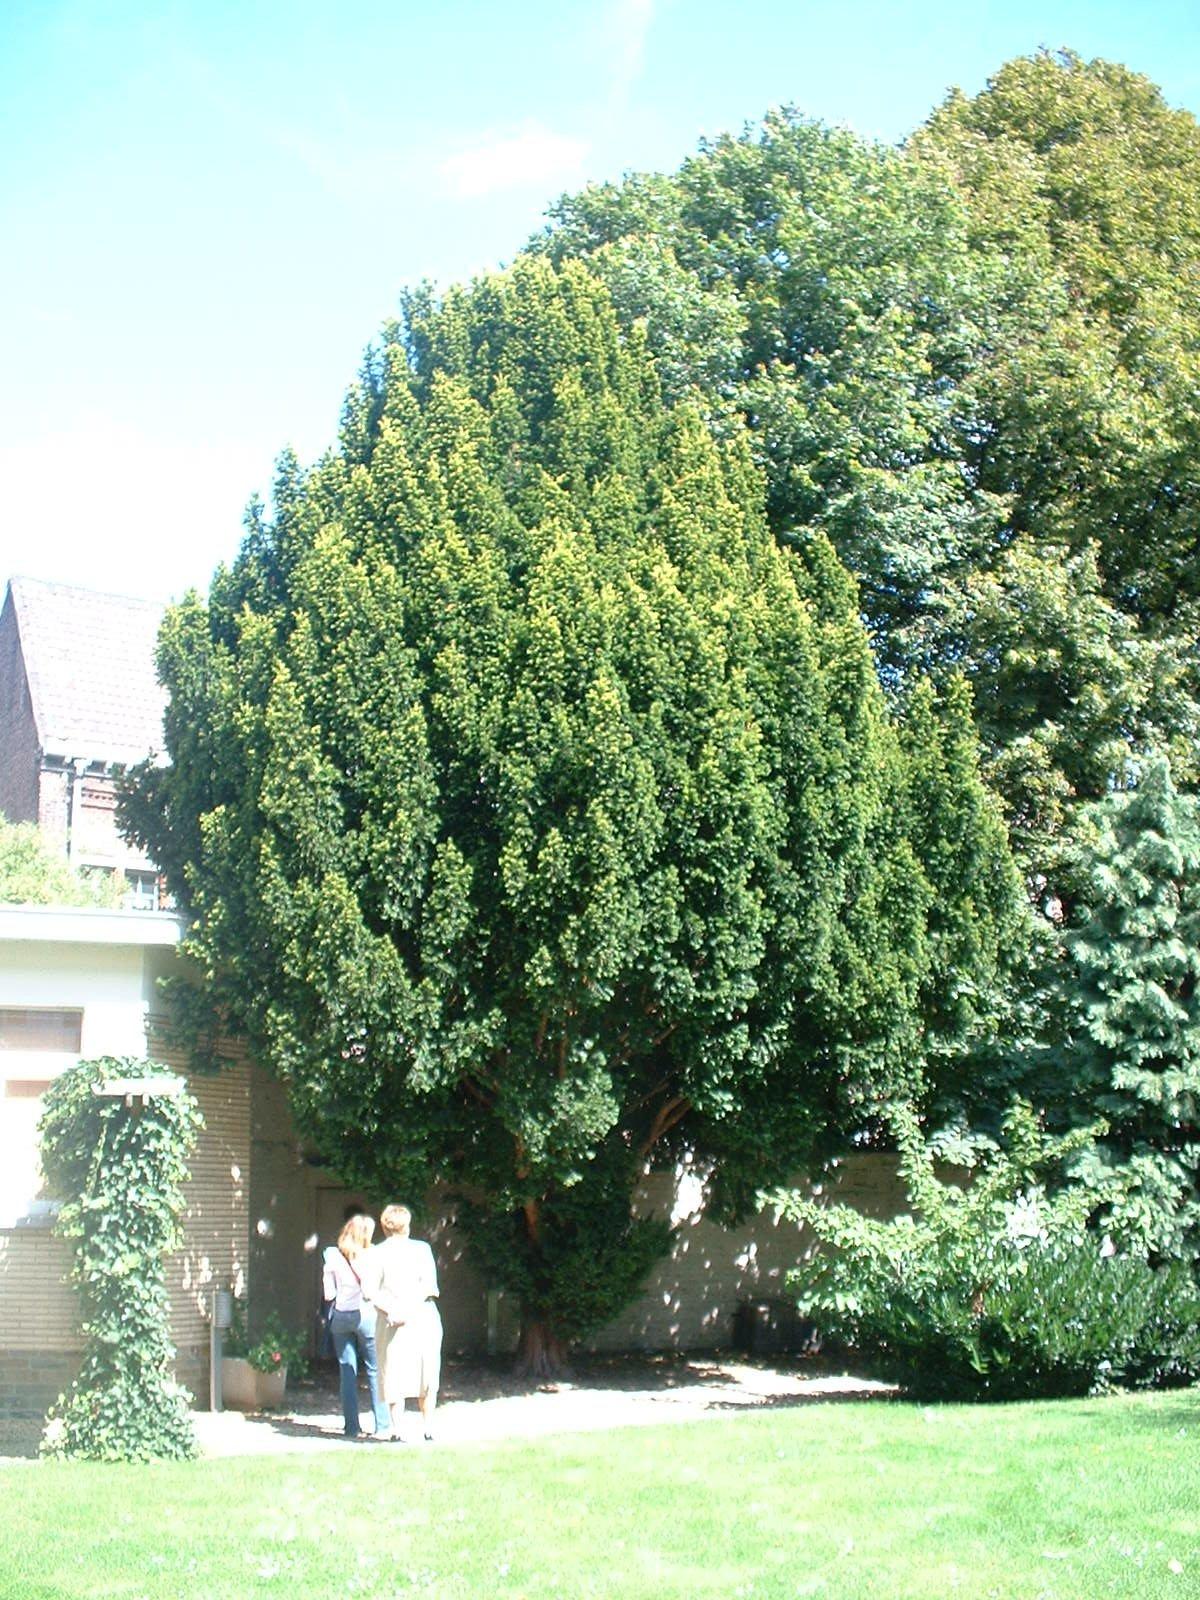 If d'Irlande – Molenbeek-Saint-Jean, Rue Vandernoot, 29 –  18 Août 2004